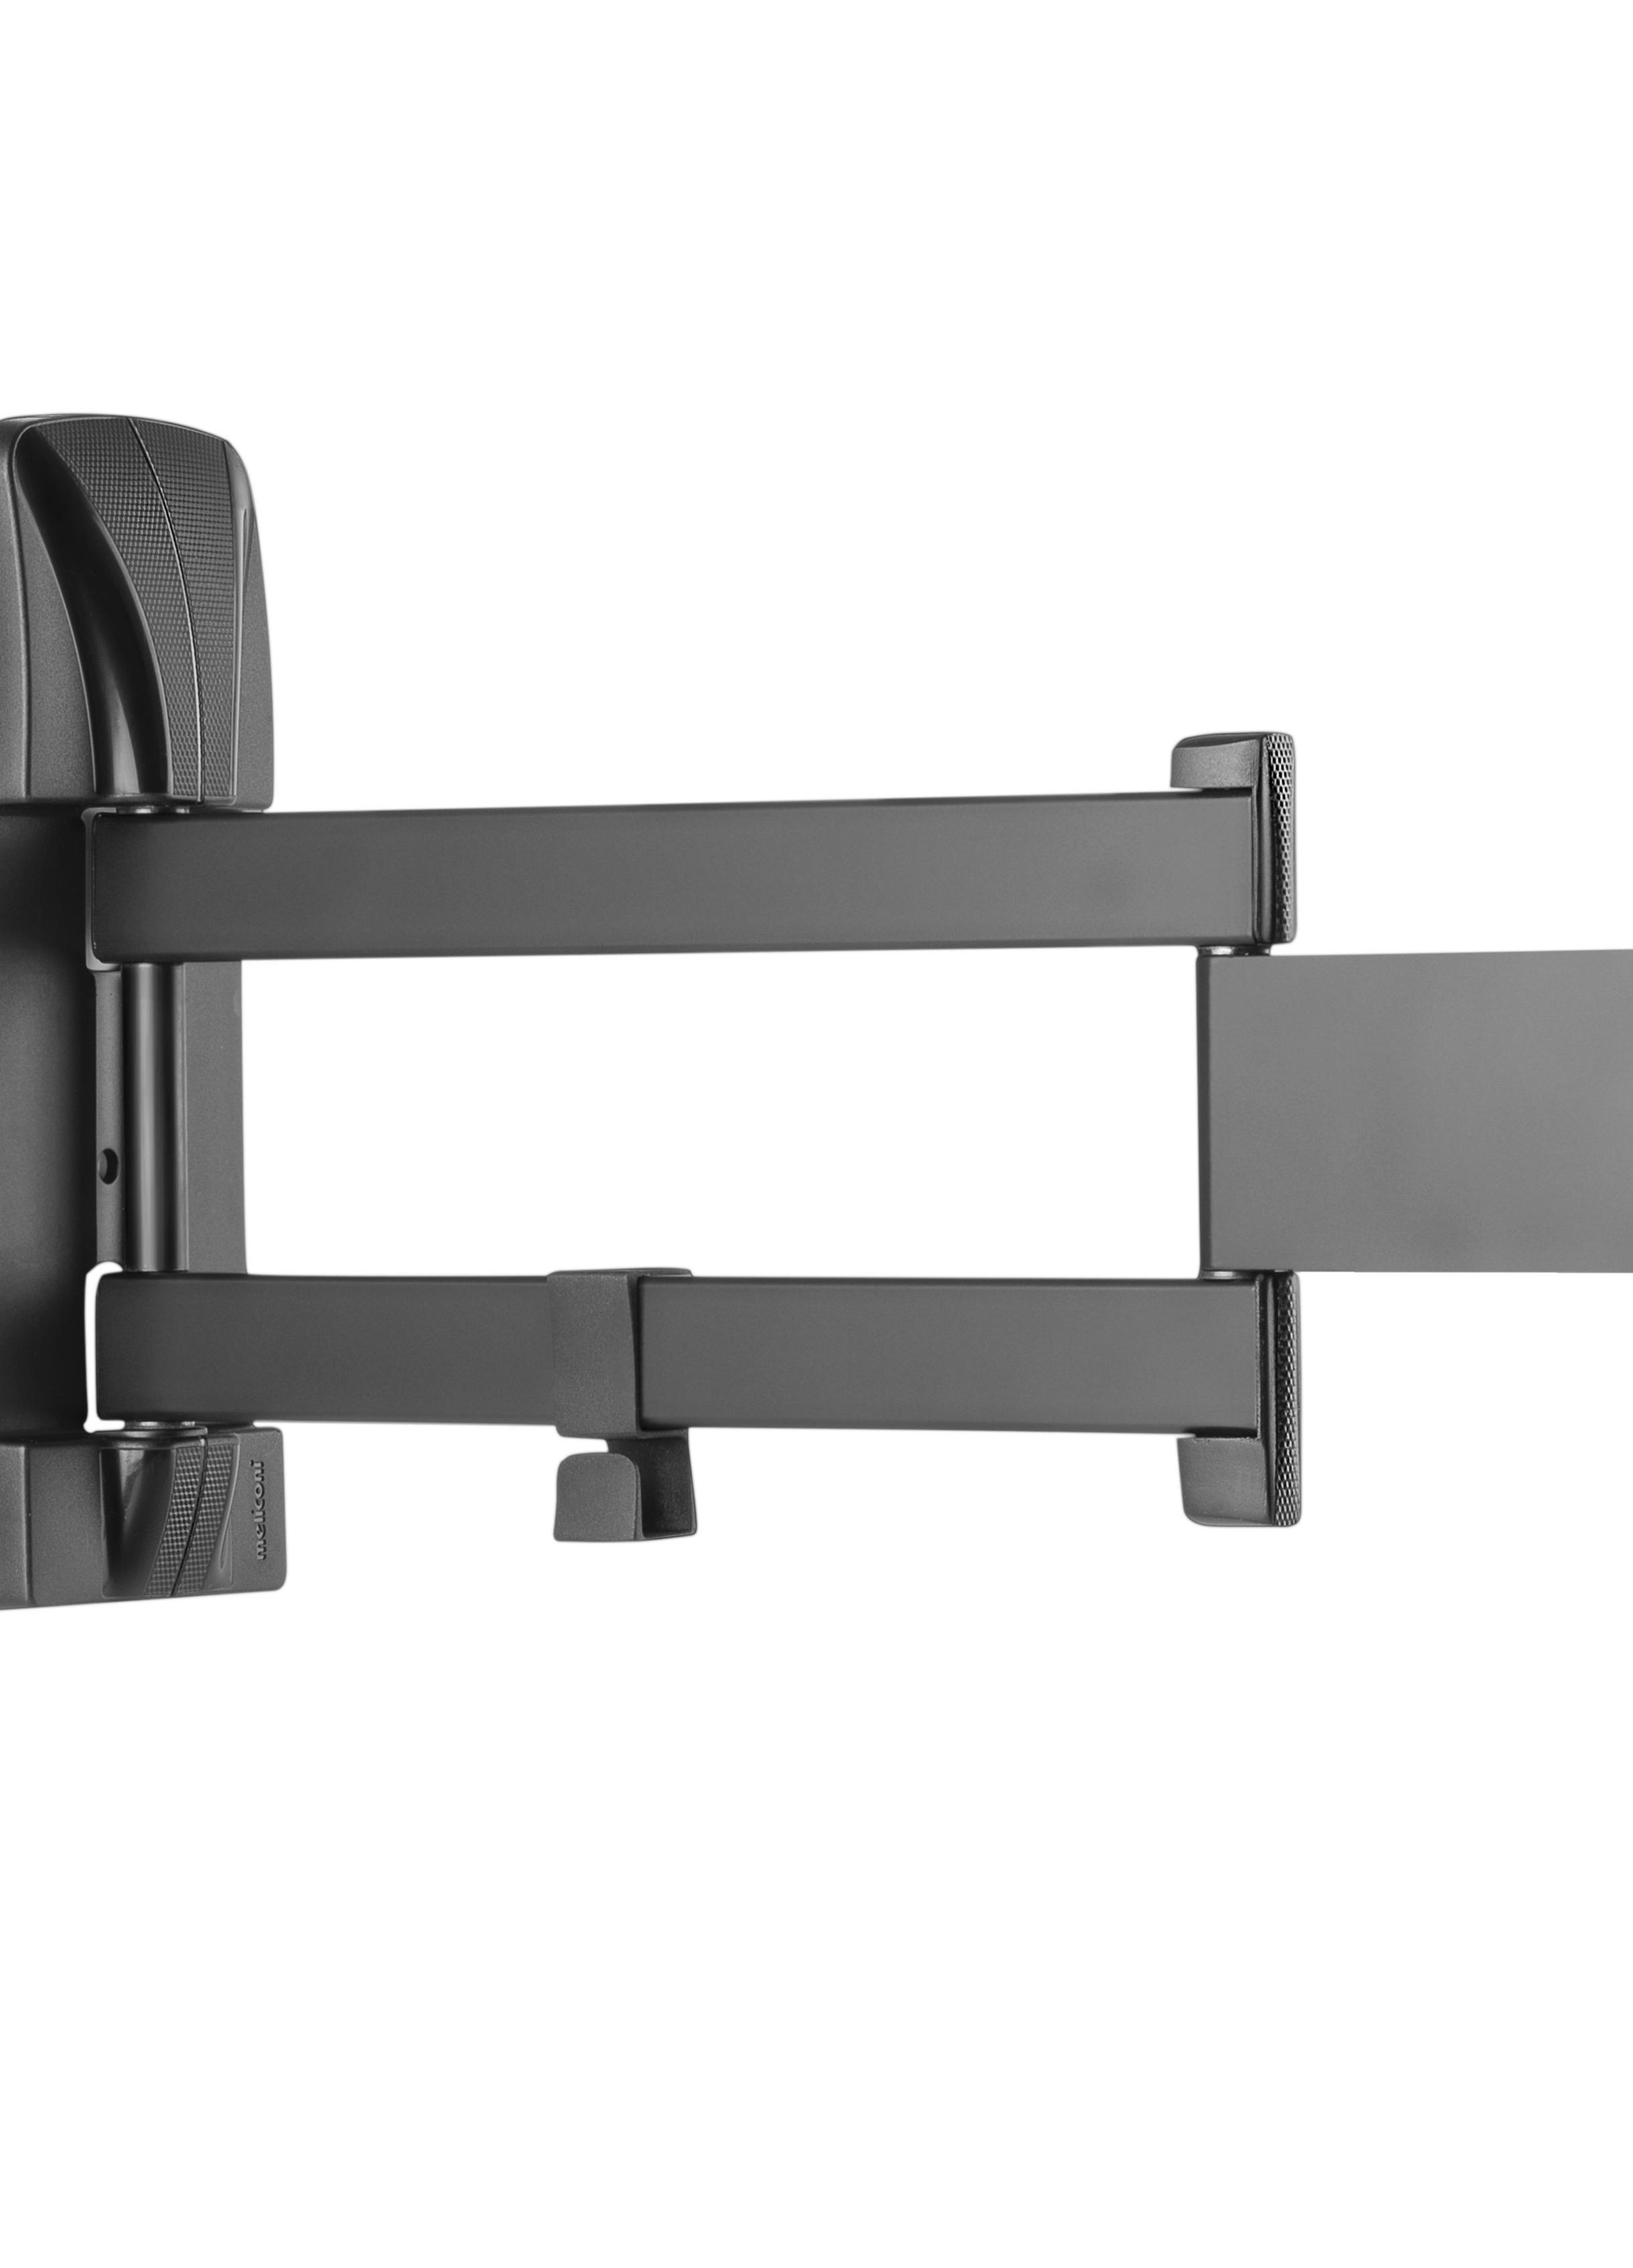 slimstyle 400 sdr tv wandhalterung 40 50 zoll schwarz. Black Bedroom Furniture Sets. Home Design Ideas